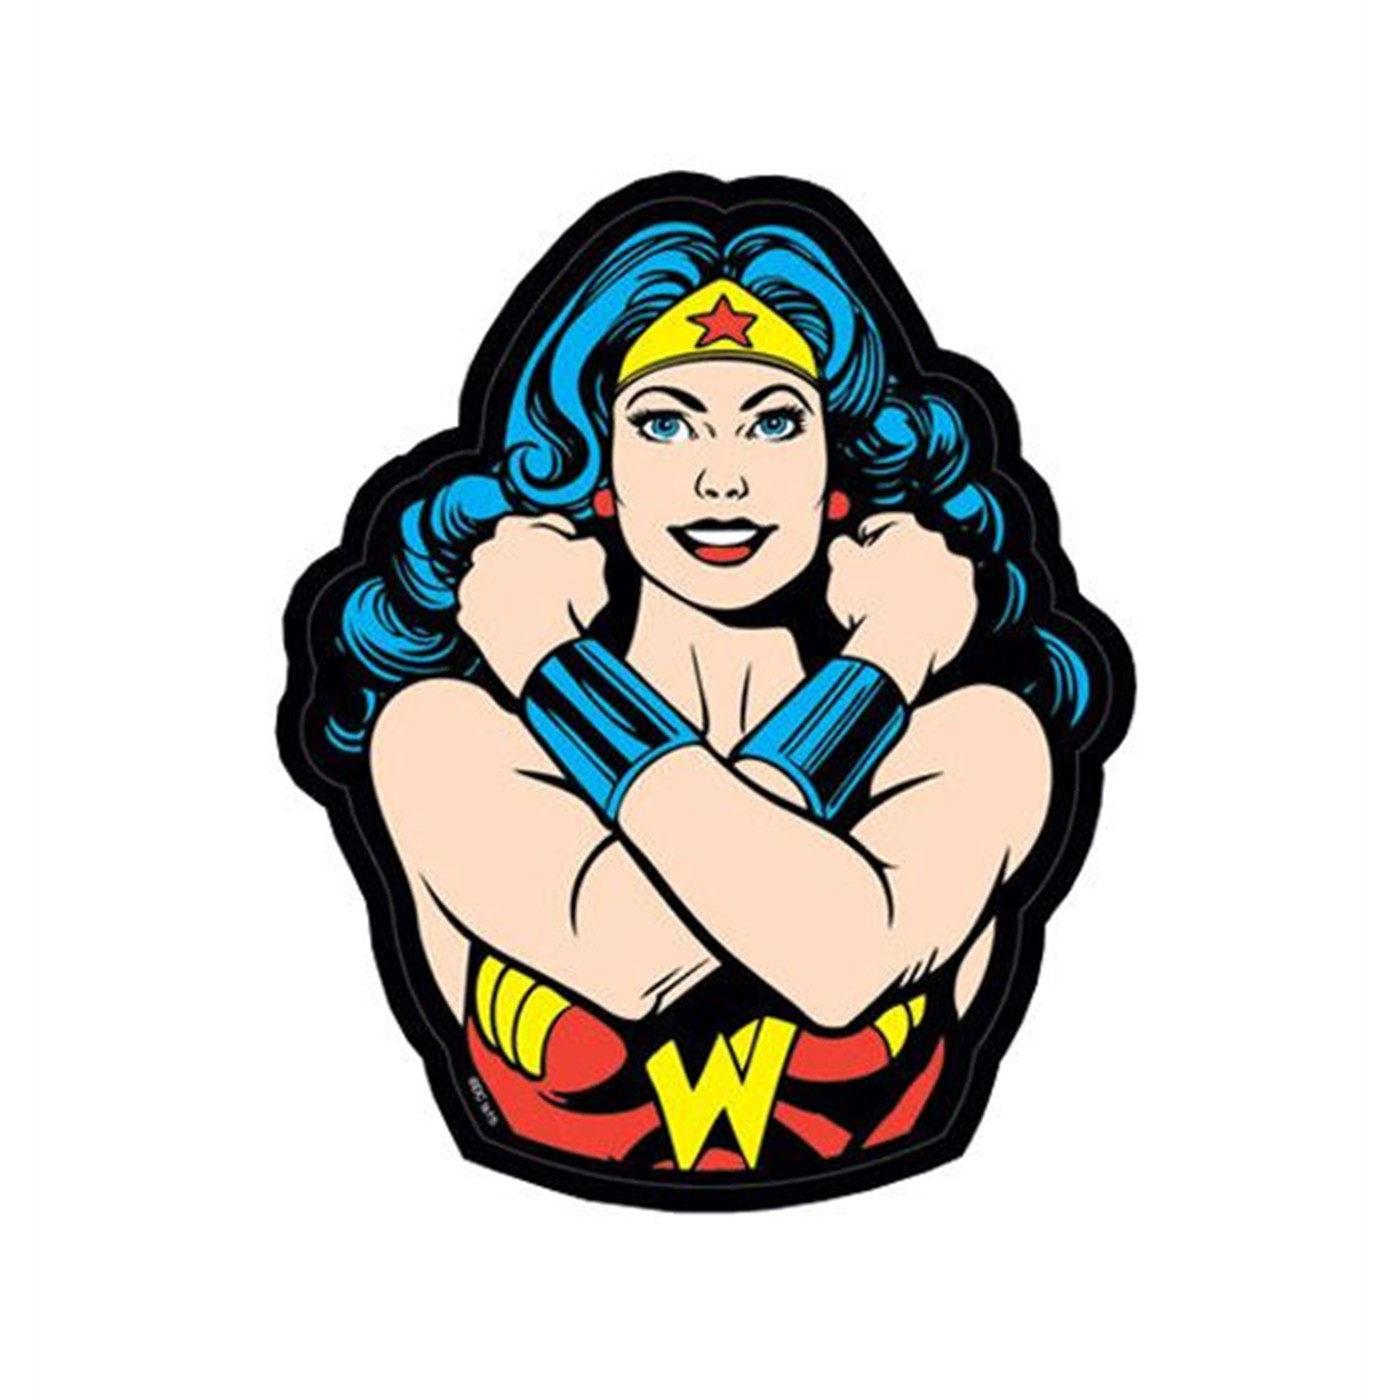 Wonder Woman Crossed Arms Sticker